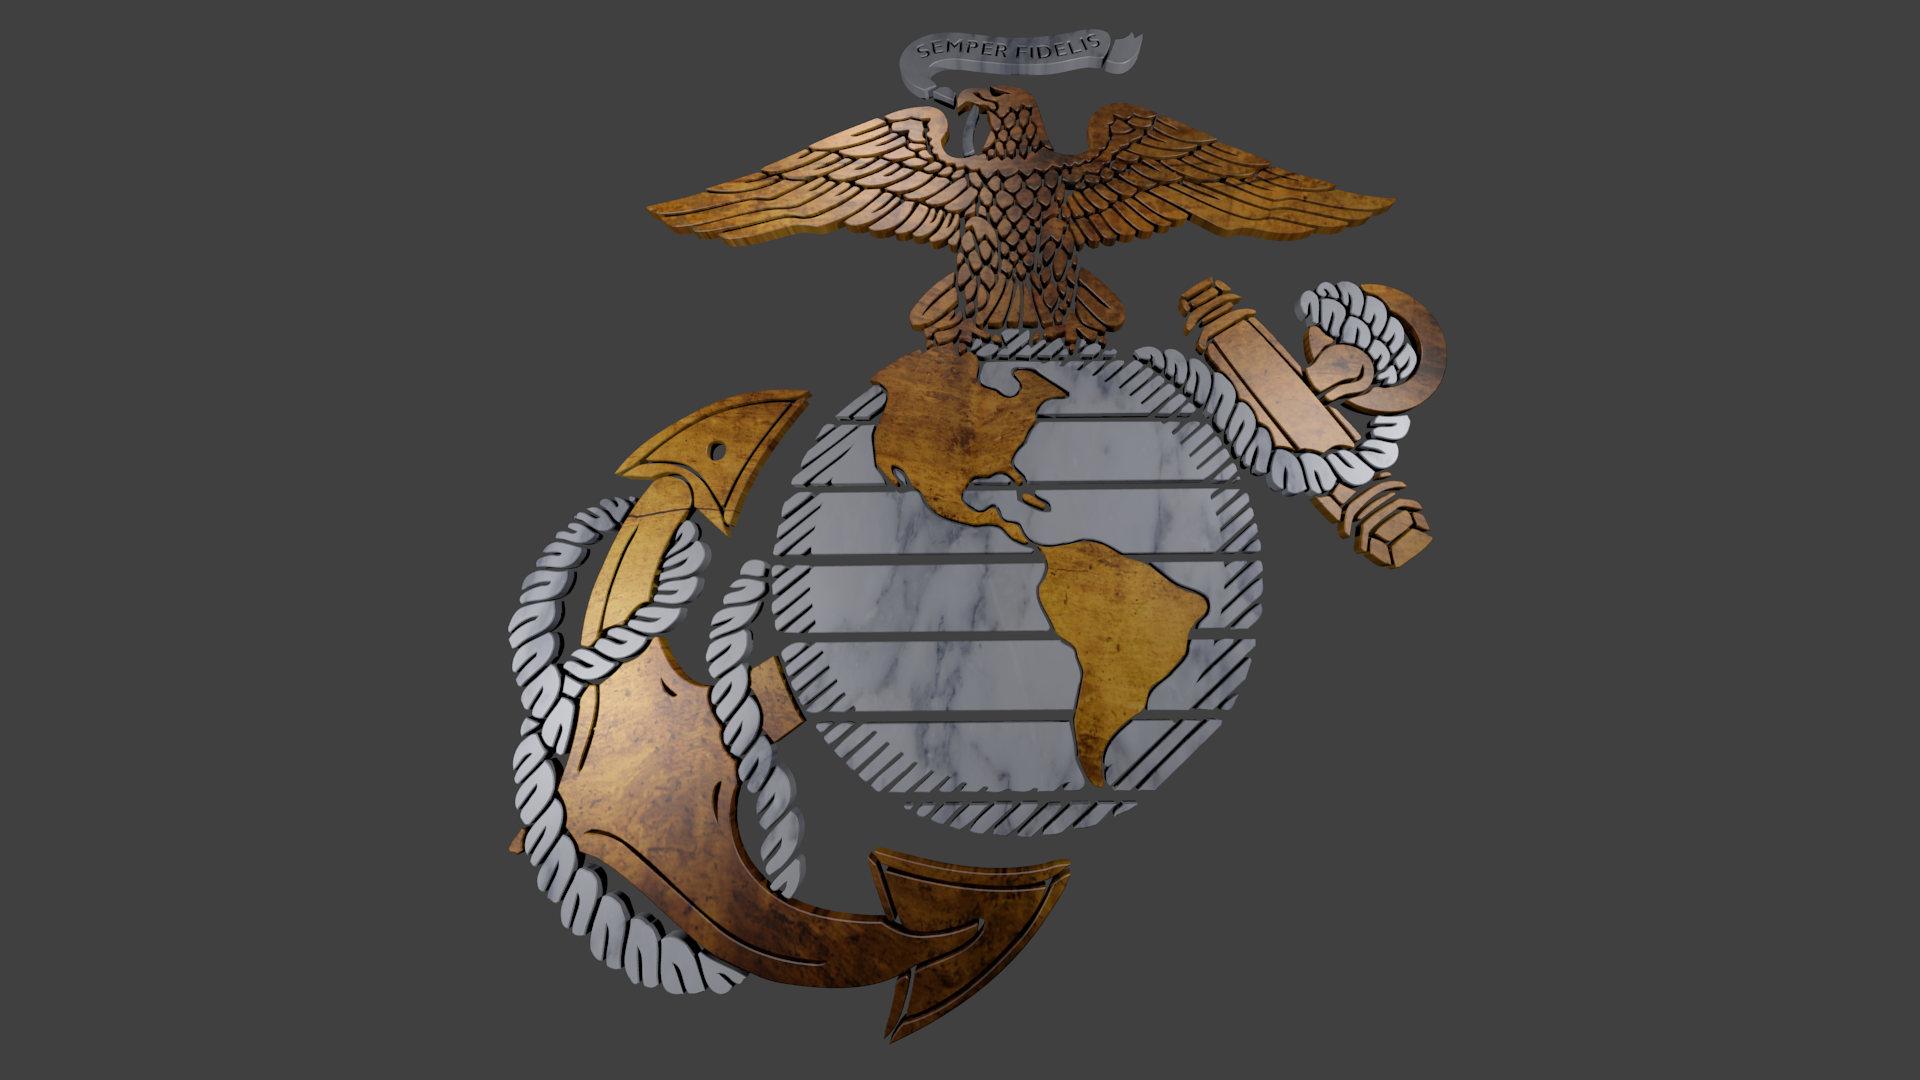 Marines USMC military wallpaper 1920x1080 46656 WallpaperUP 1920x1080